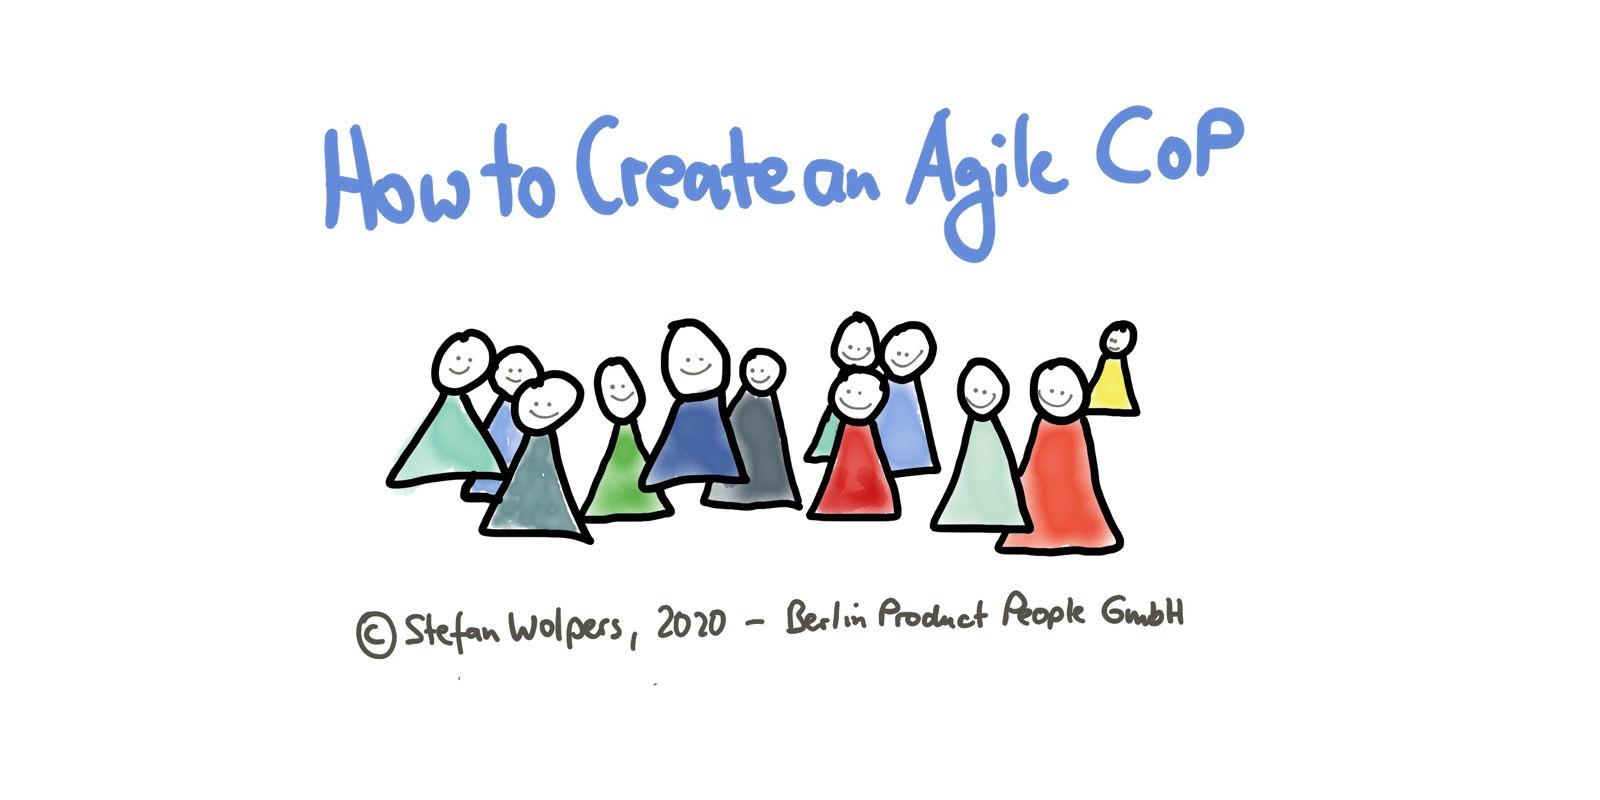 How to Create an Agile CoP